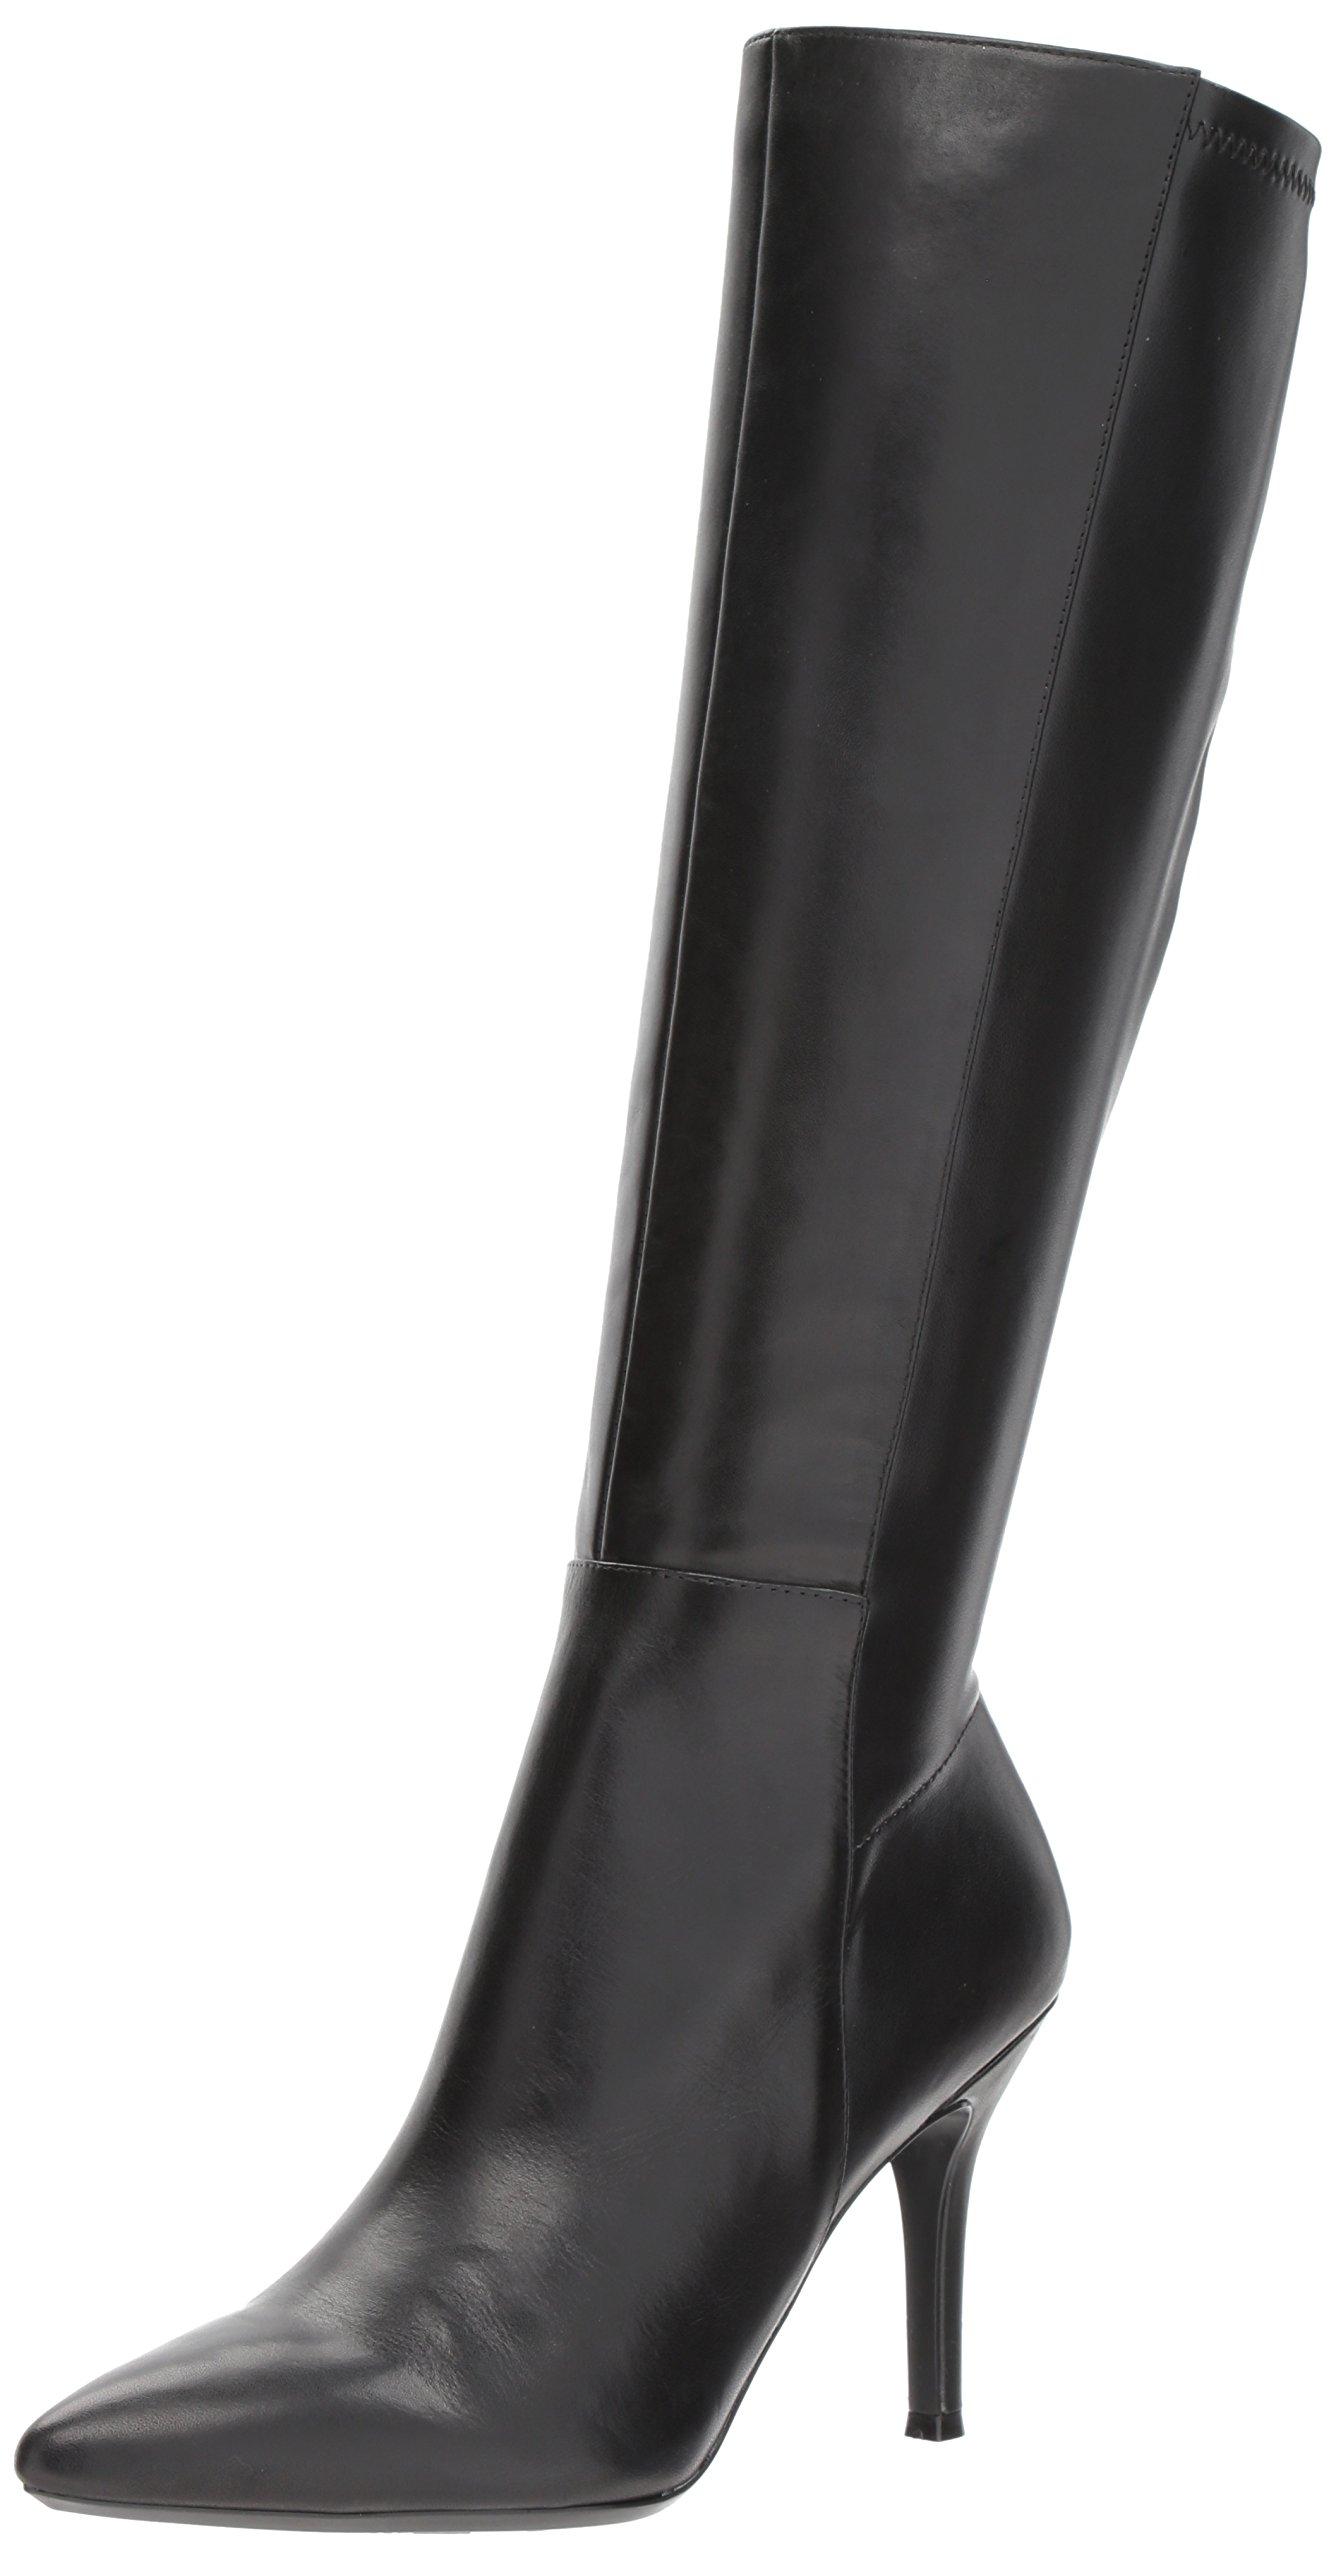 Nine West Women's Fallon, Black Leather, 7.5 Medium US